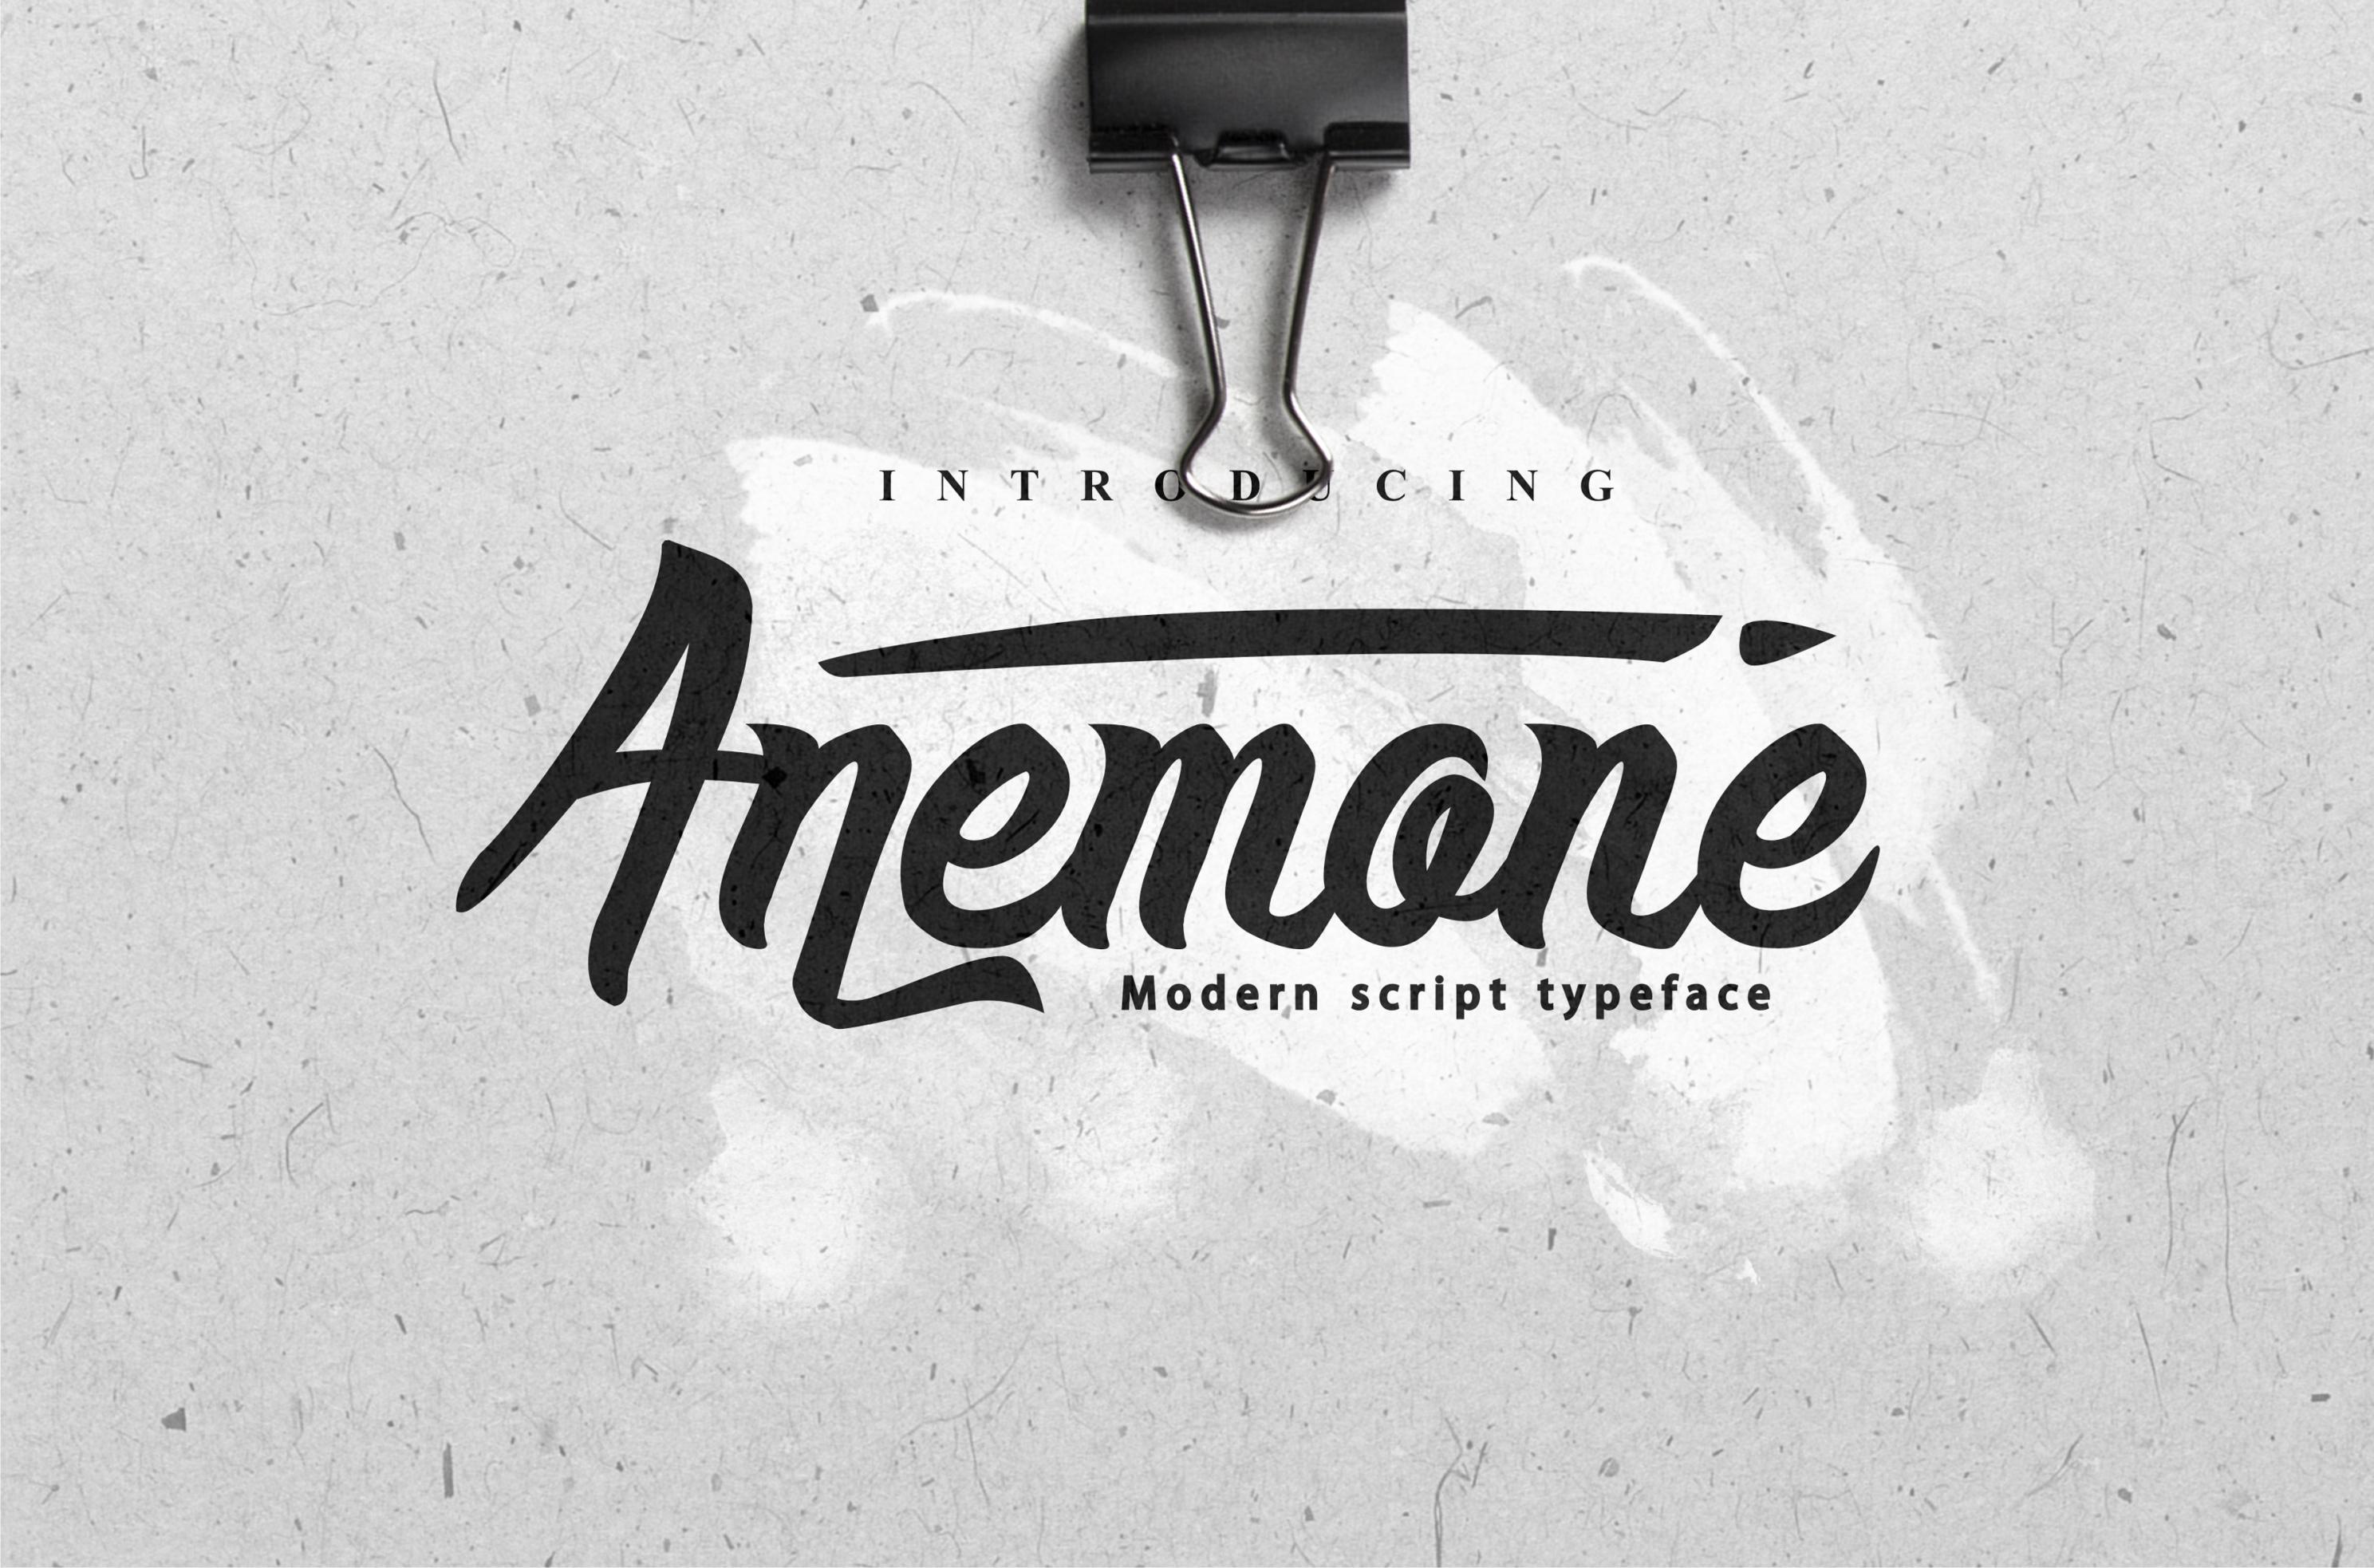 anemone-script-font1